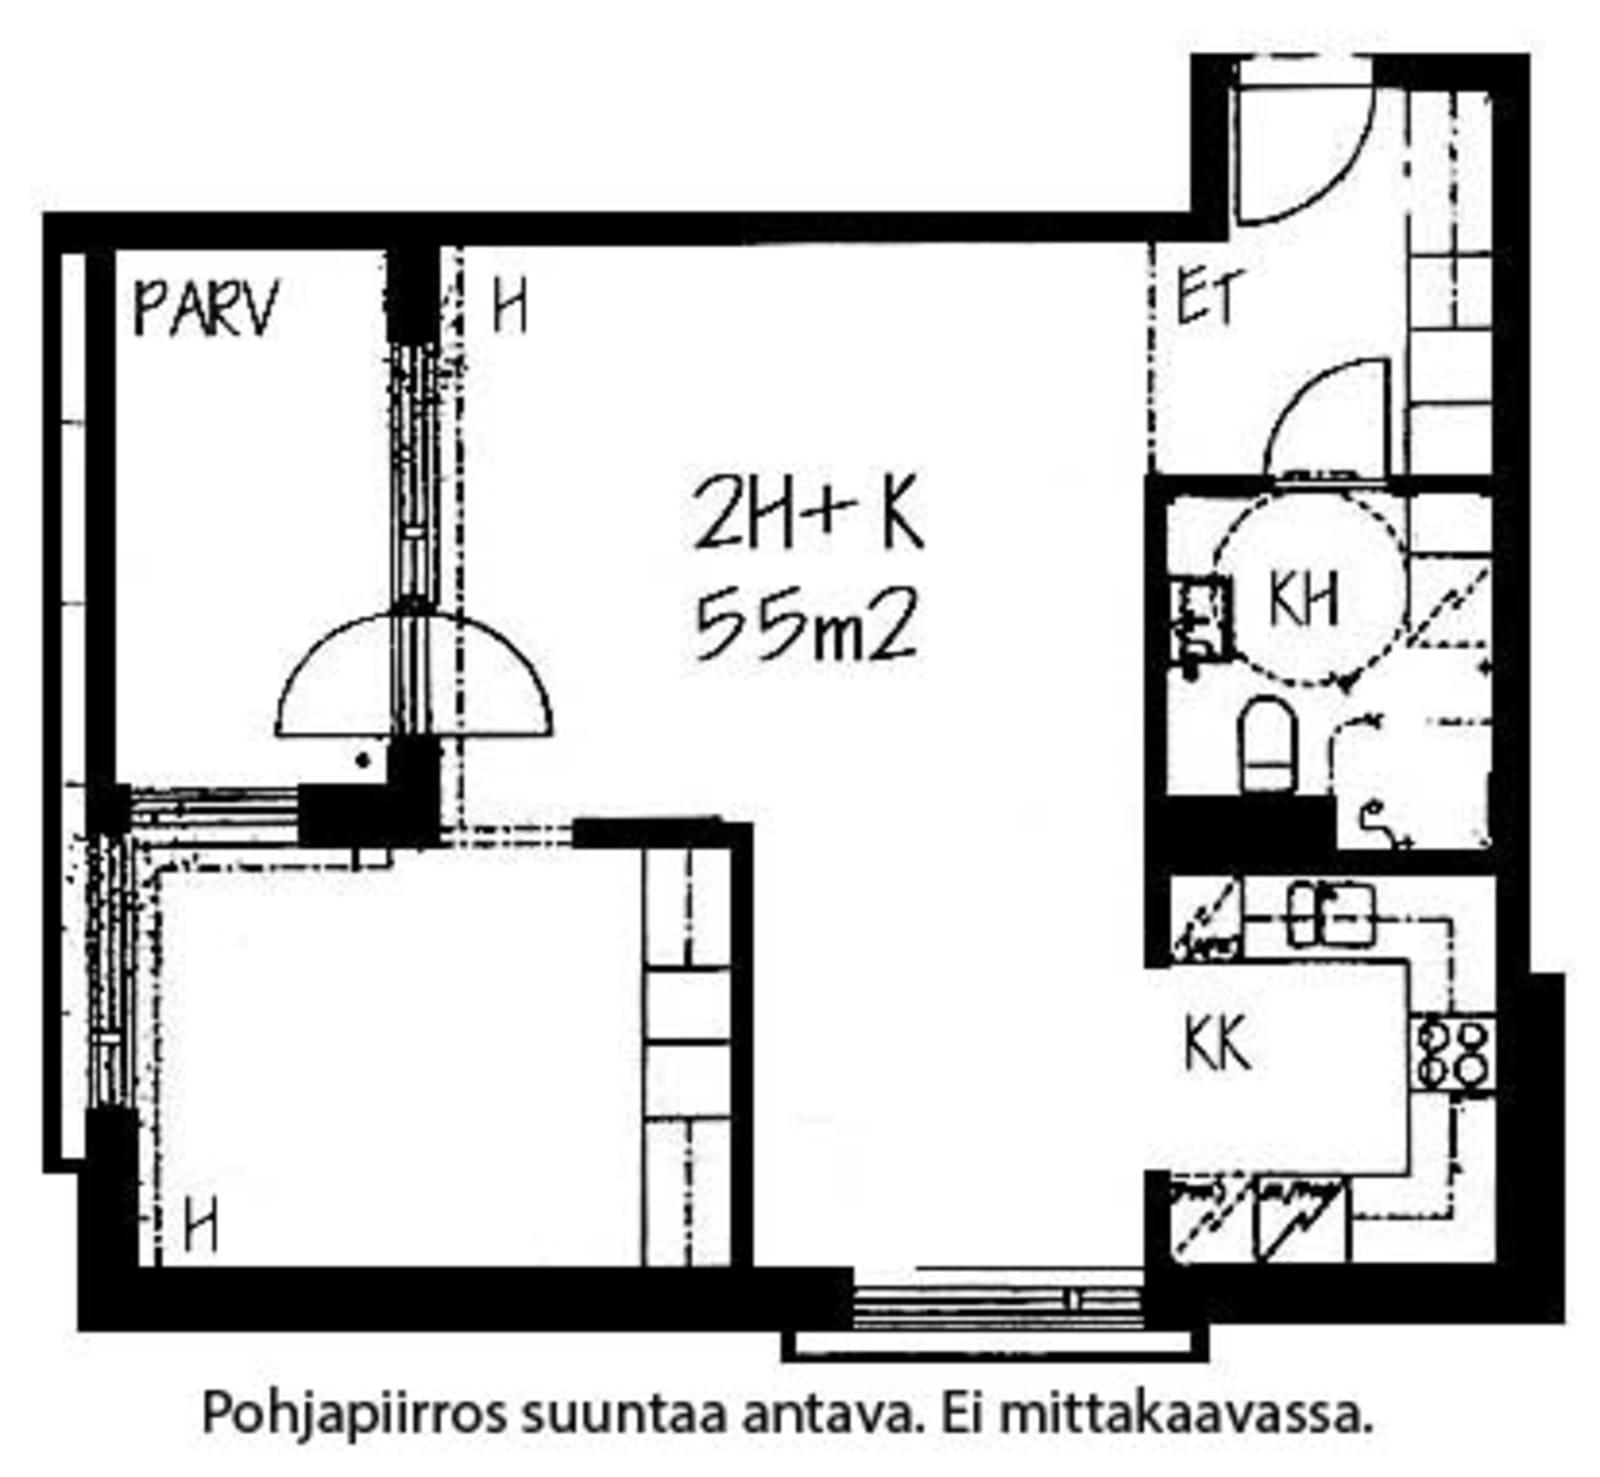 Helsinki, Herttoniemi, Laivalahdenportti 5 A 004